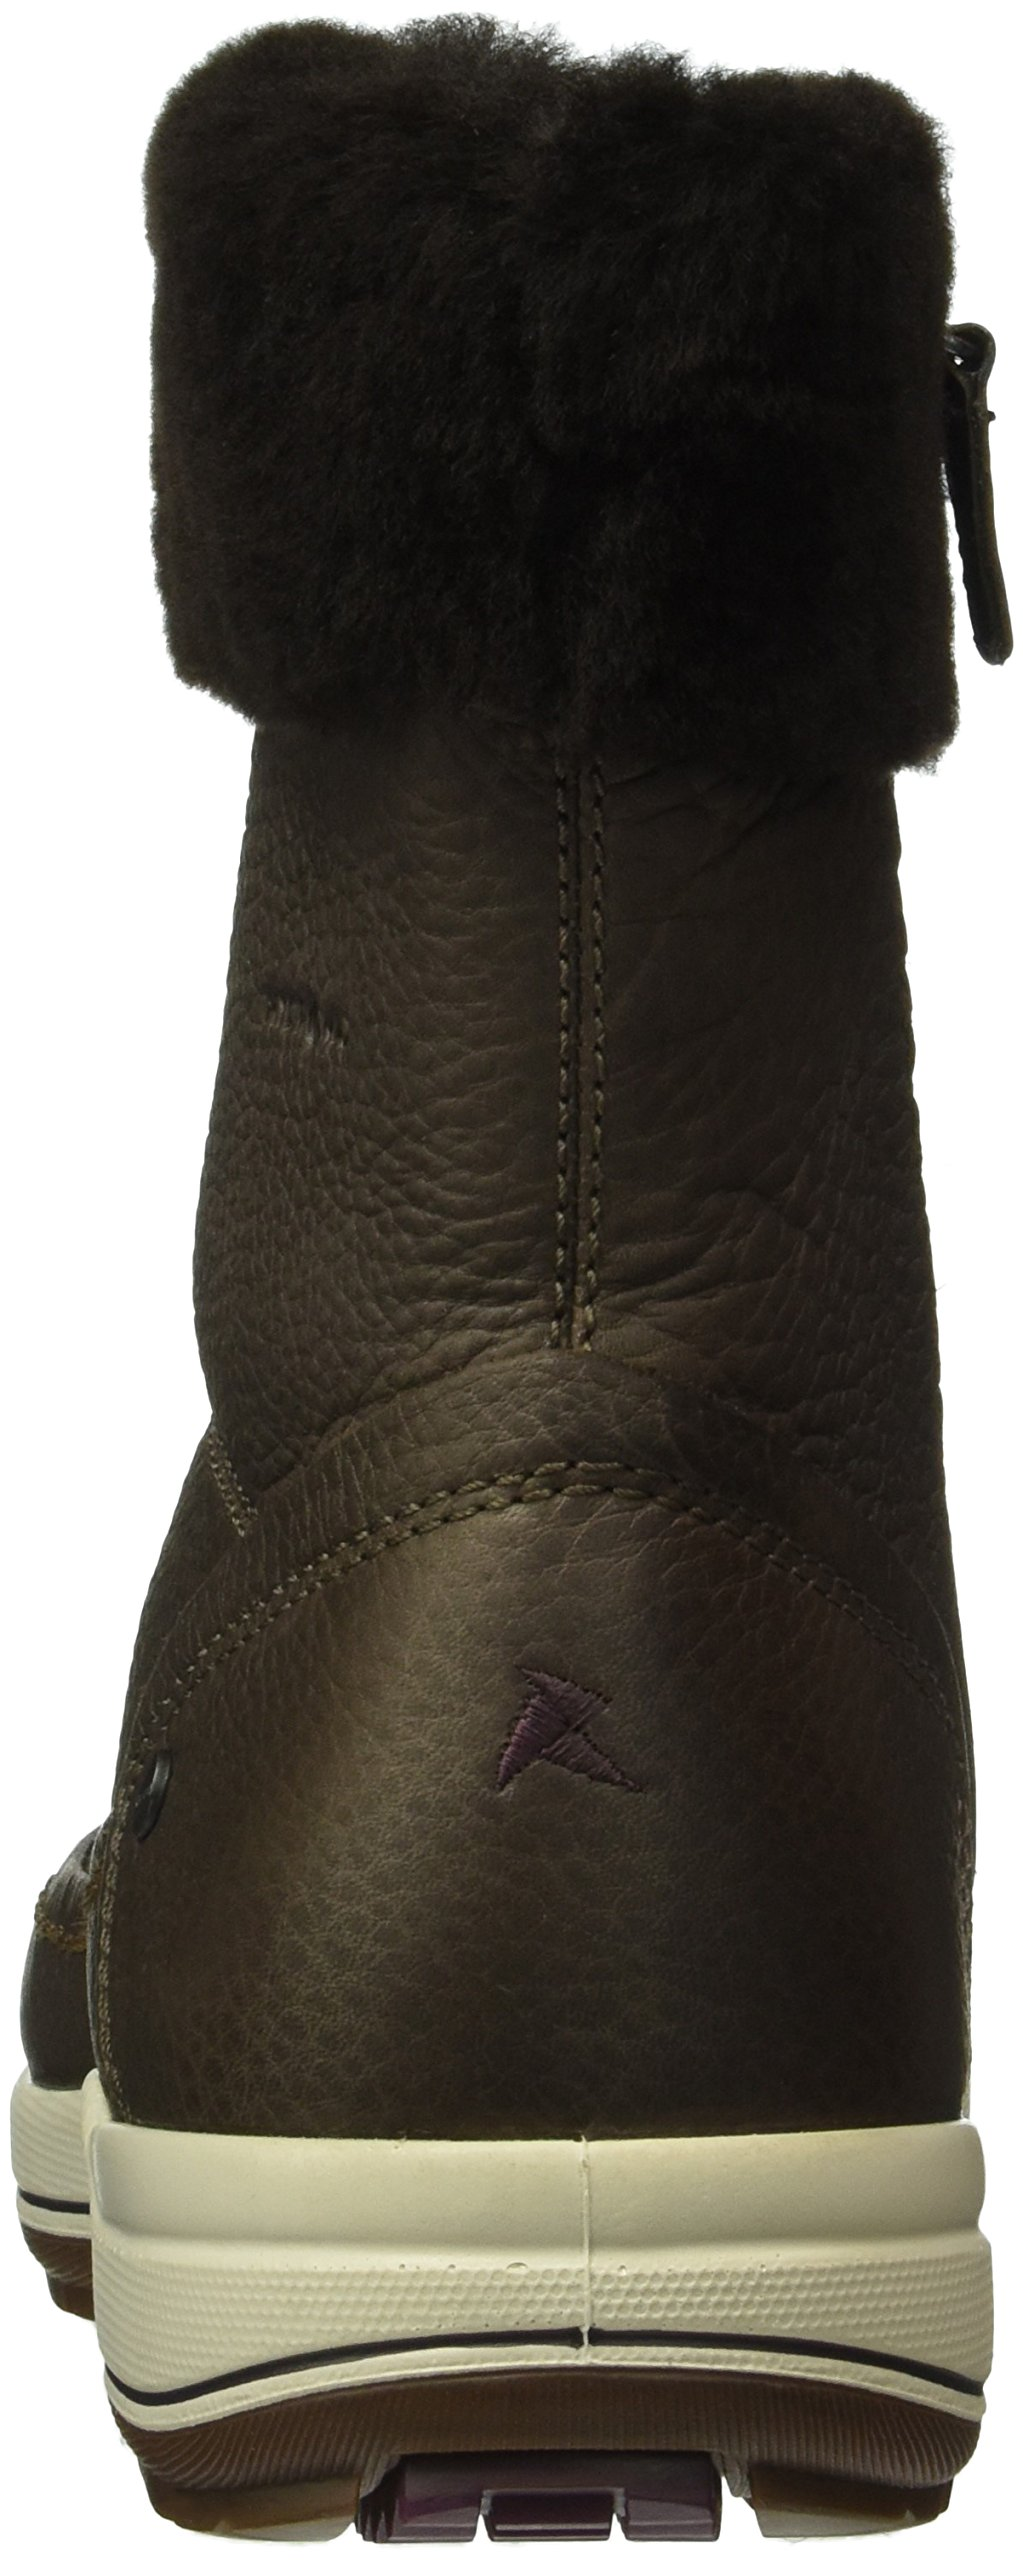 813nk0ZRPRL - ECCO Women's Trace Boot-w Multisport Outdoor Shoes